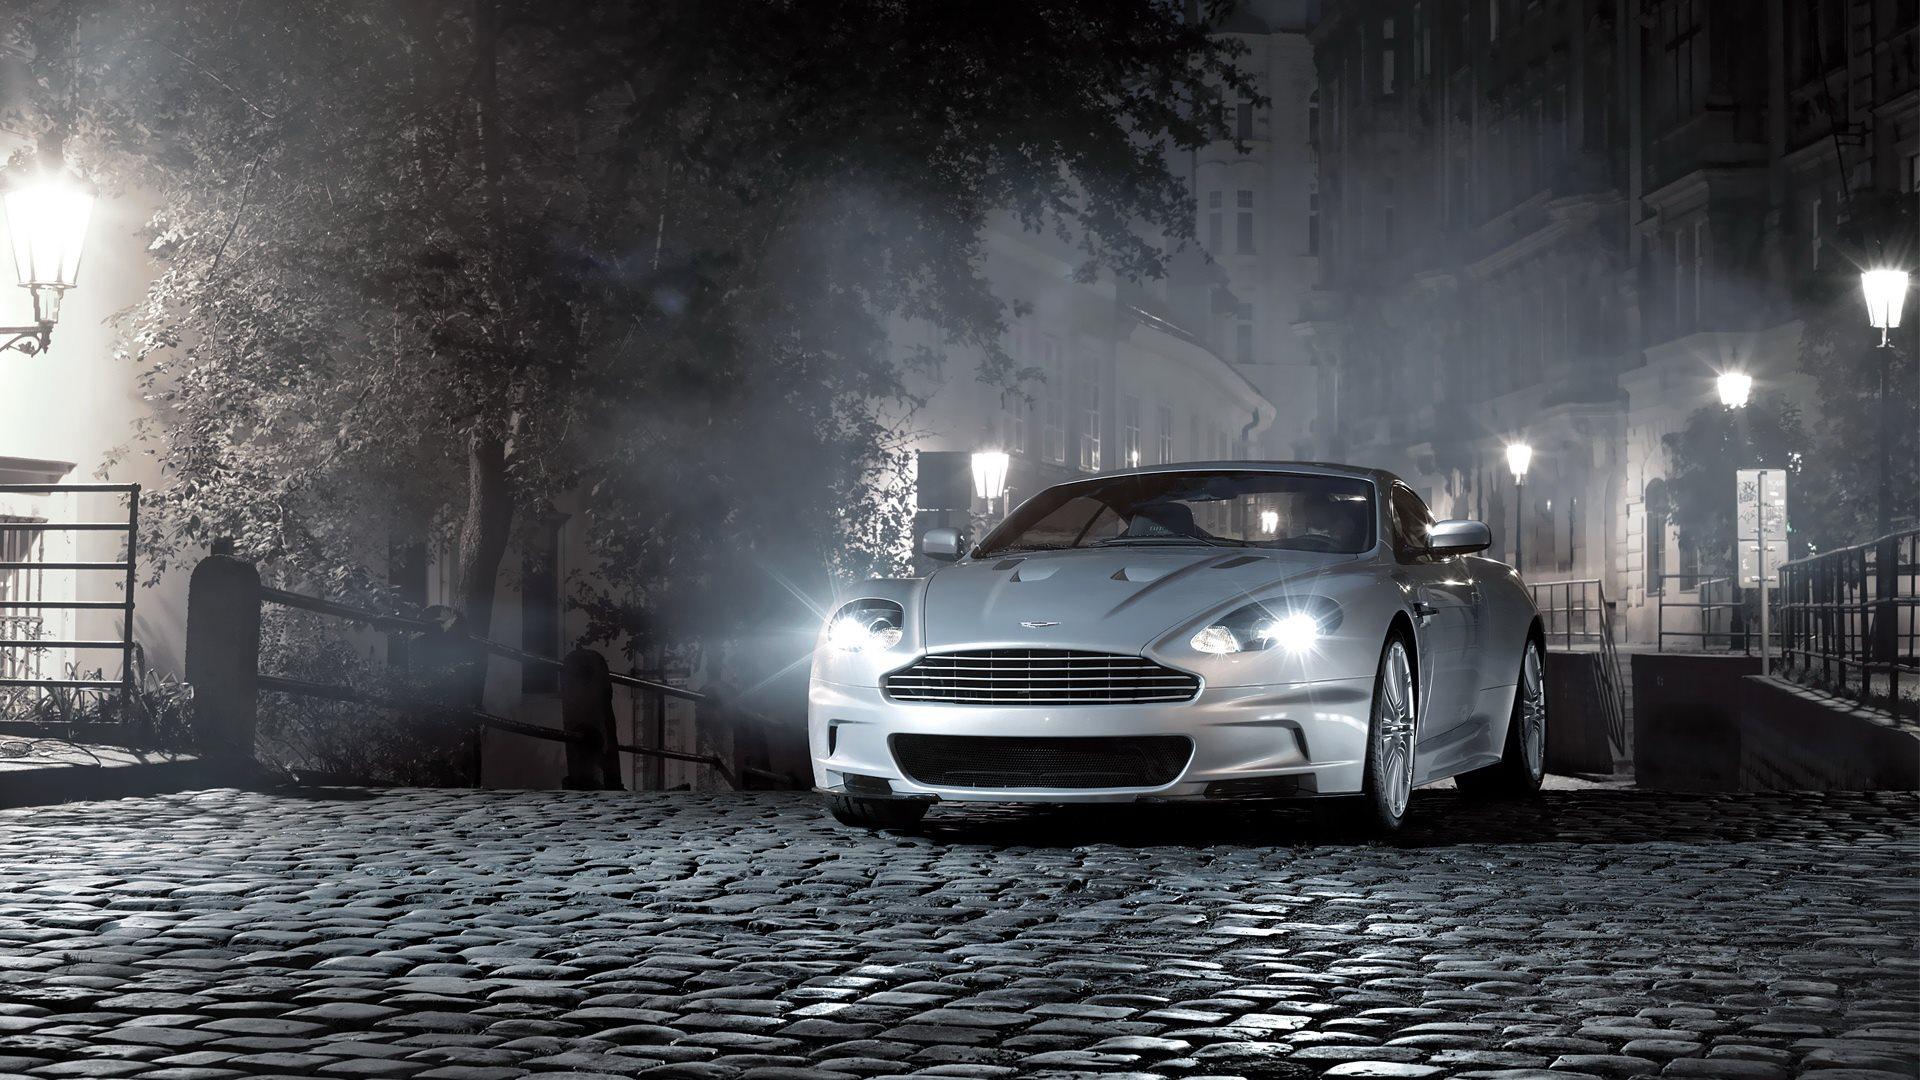 Aston Martin Wallpapers Hd